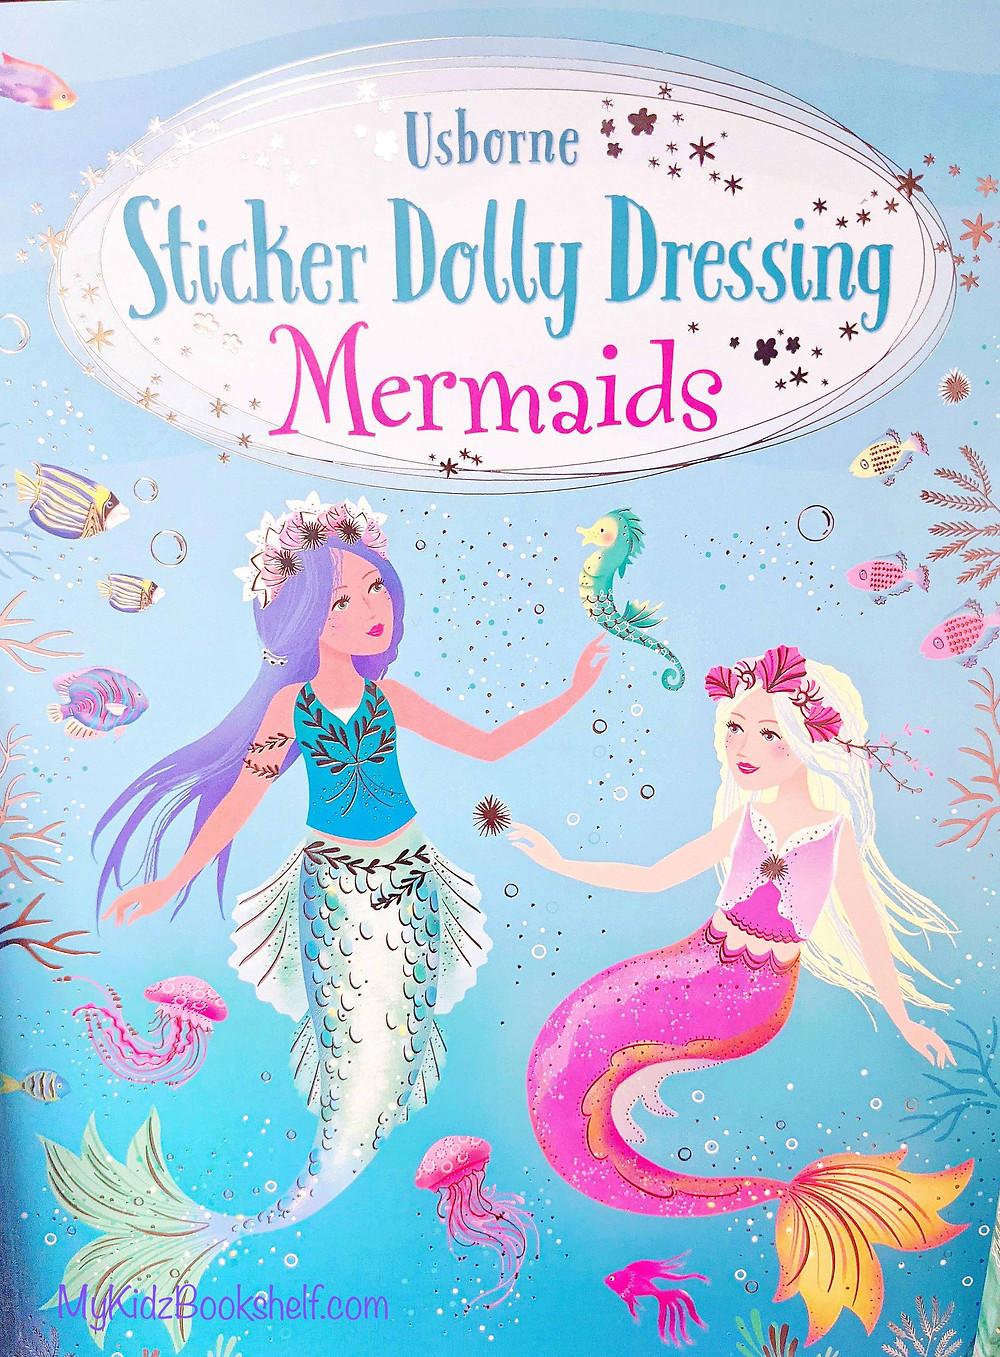 Usborne Sticker Dolly Dressing Mermaids book for kids